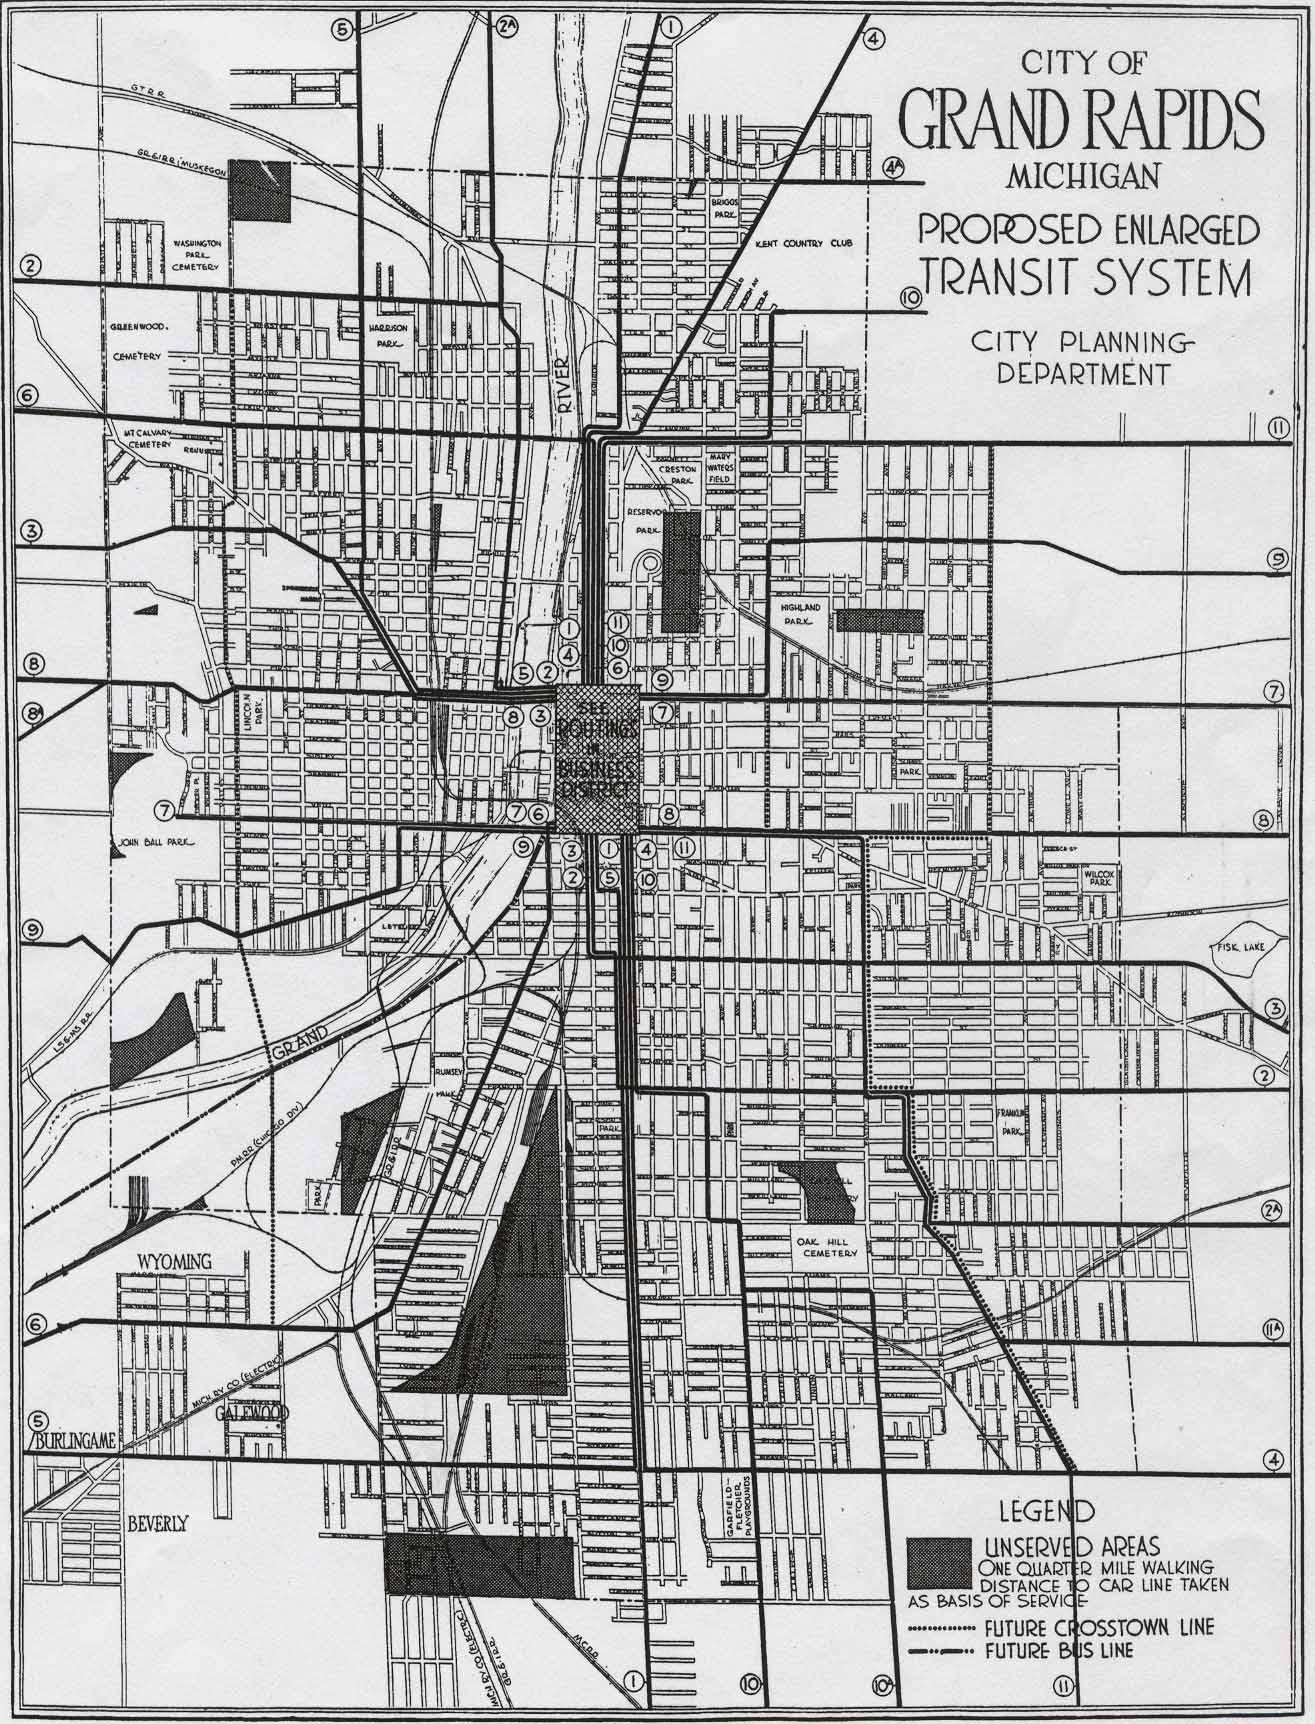 grand rapids transit system map. grand rapids transit system map  history grand rapids